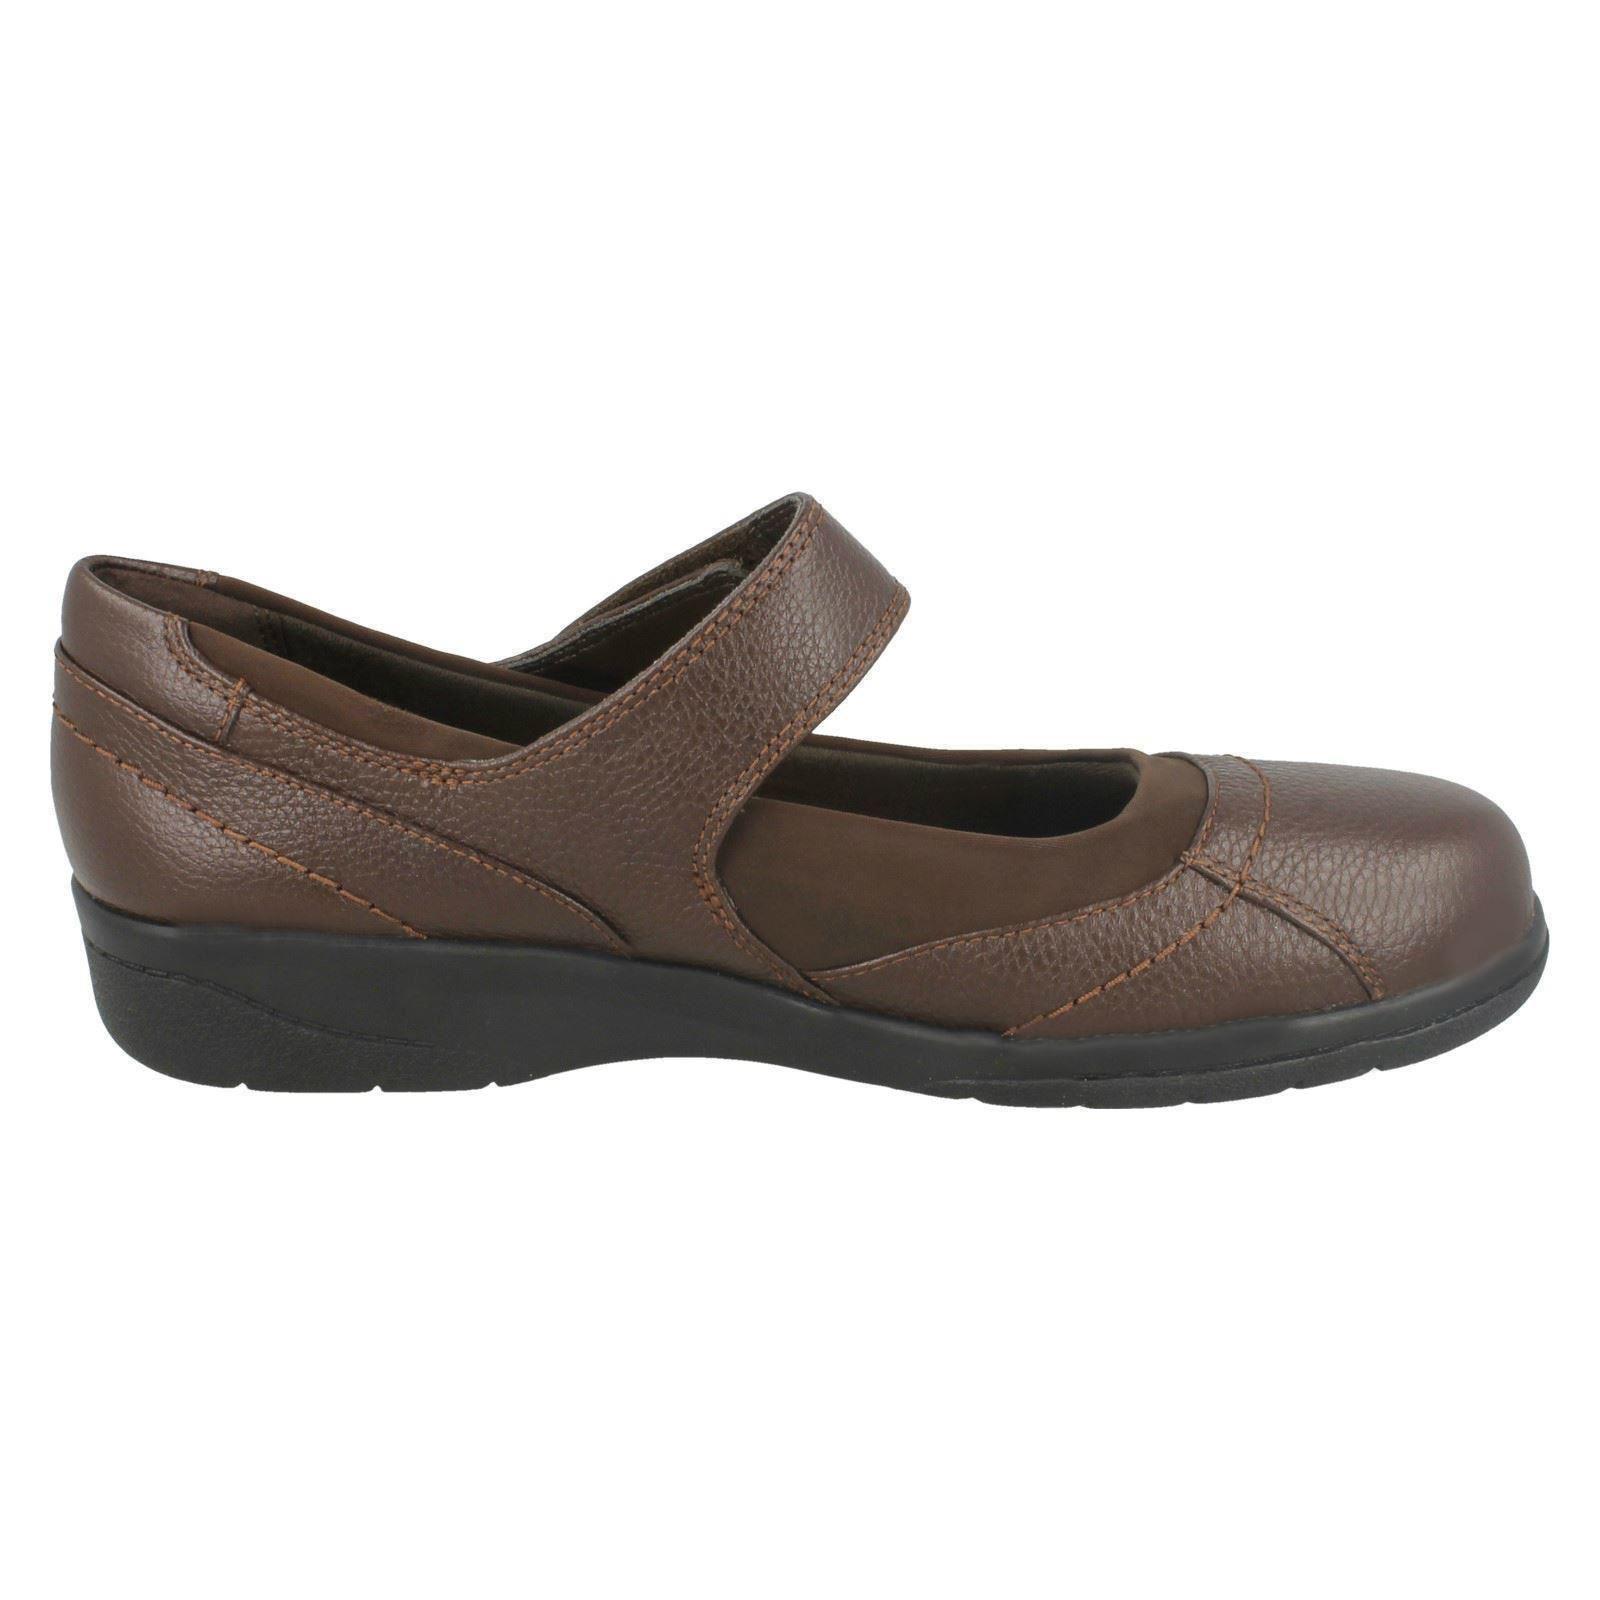 Clarks-Ladies-Casual-Shoes-Cheyn-Web